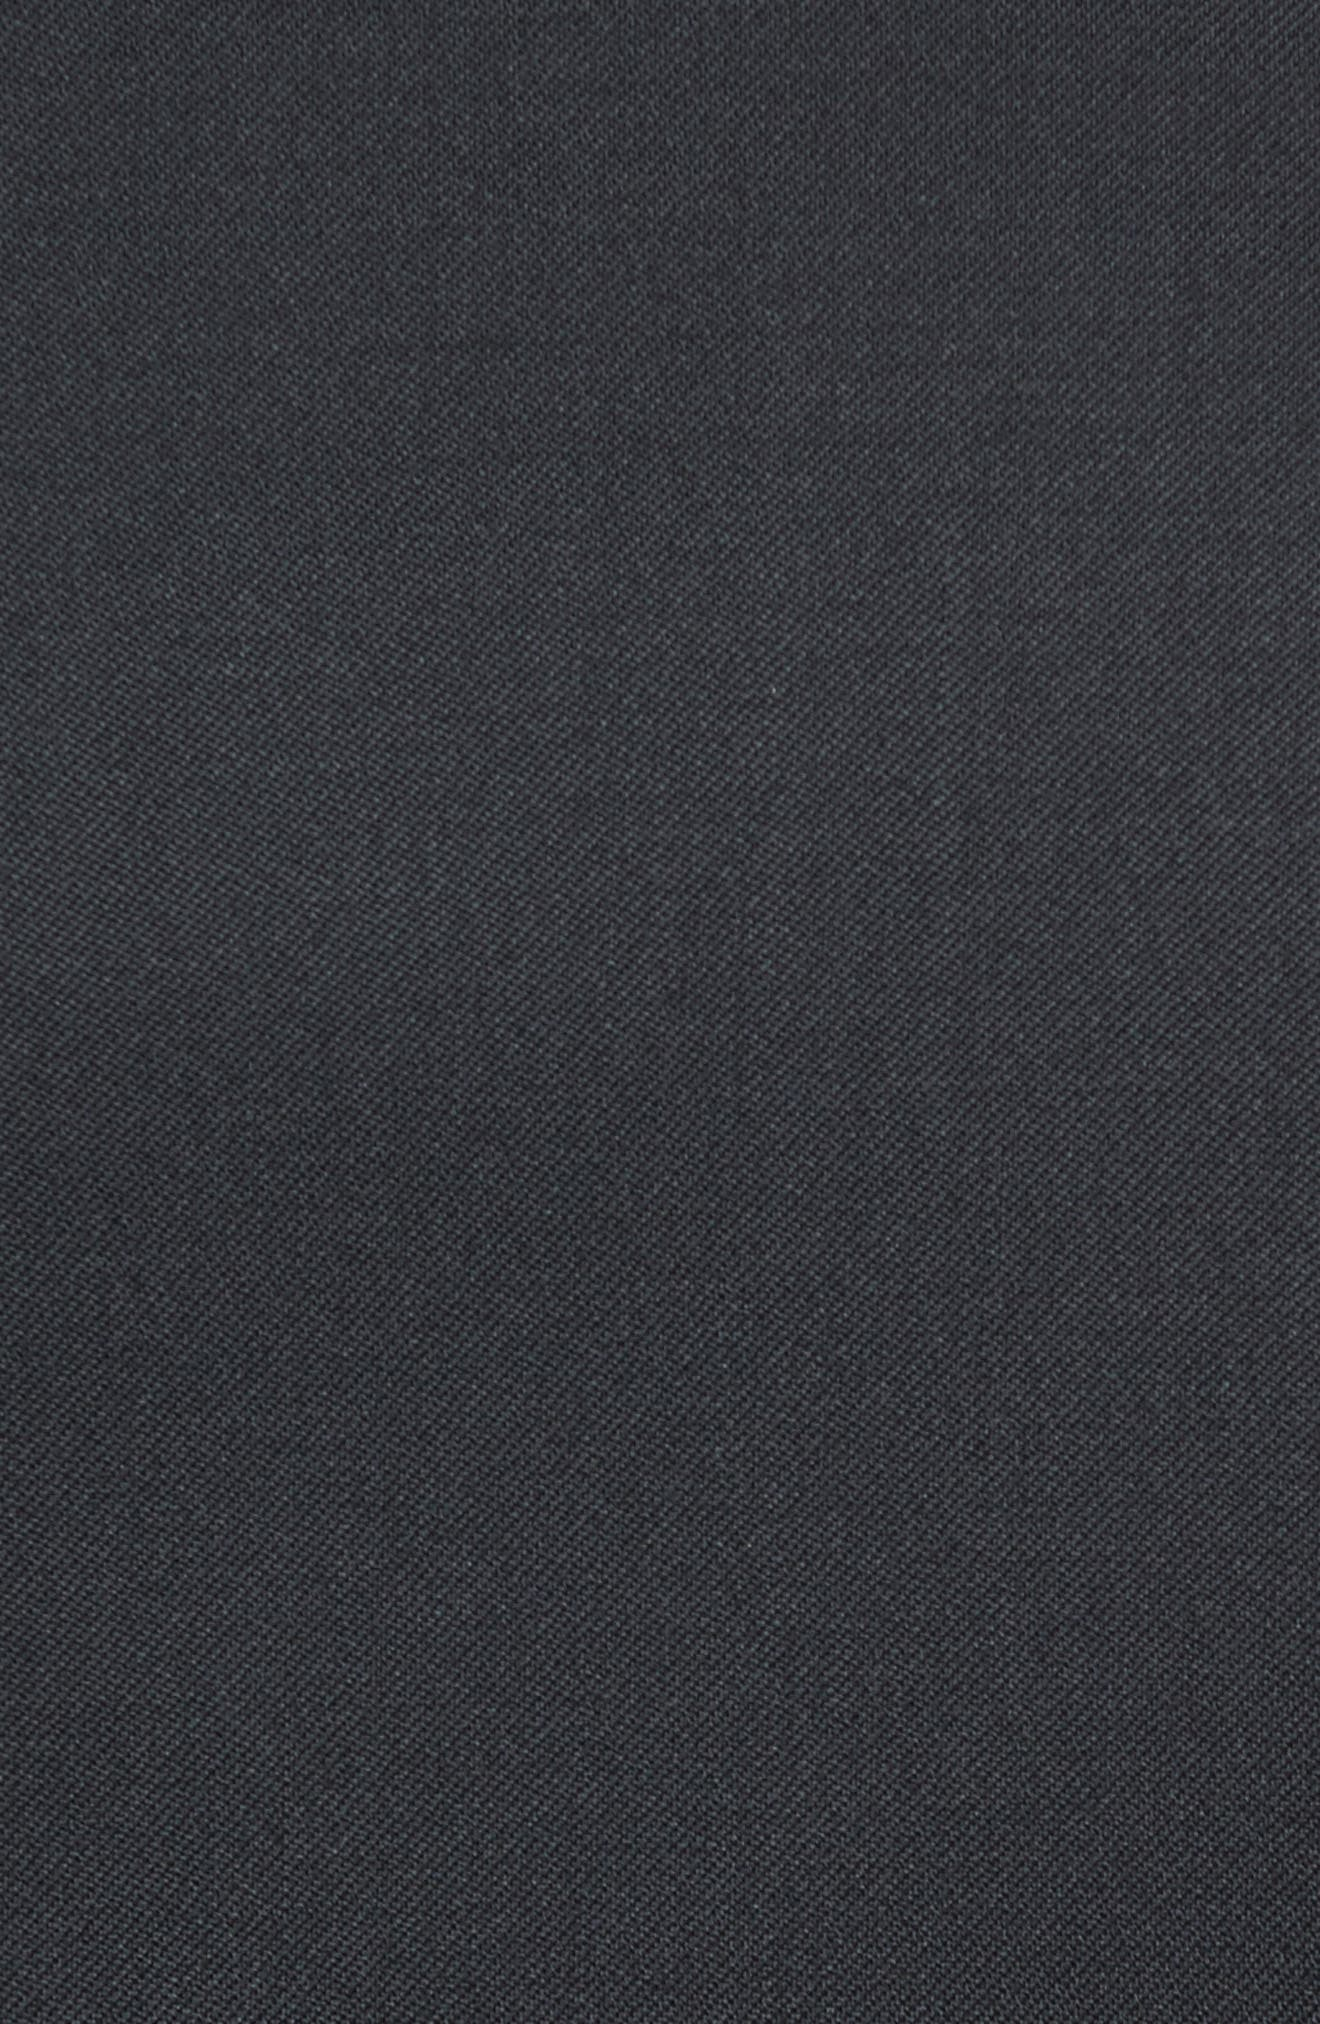 Russell Classic Fit Loro Piana Wool Tuxedo,                             Alternate thumbnail 4, color,                             BLACK